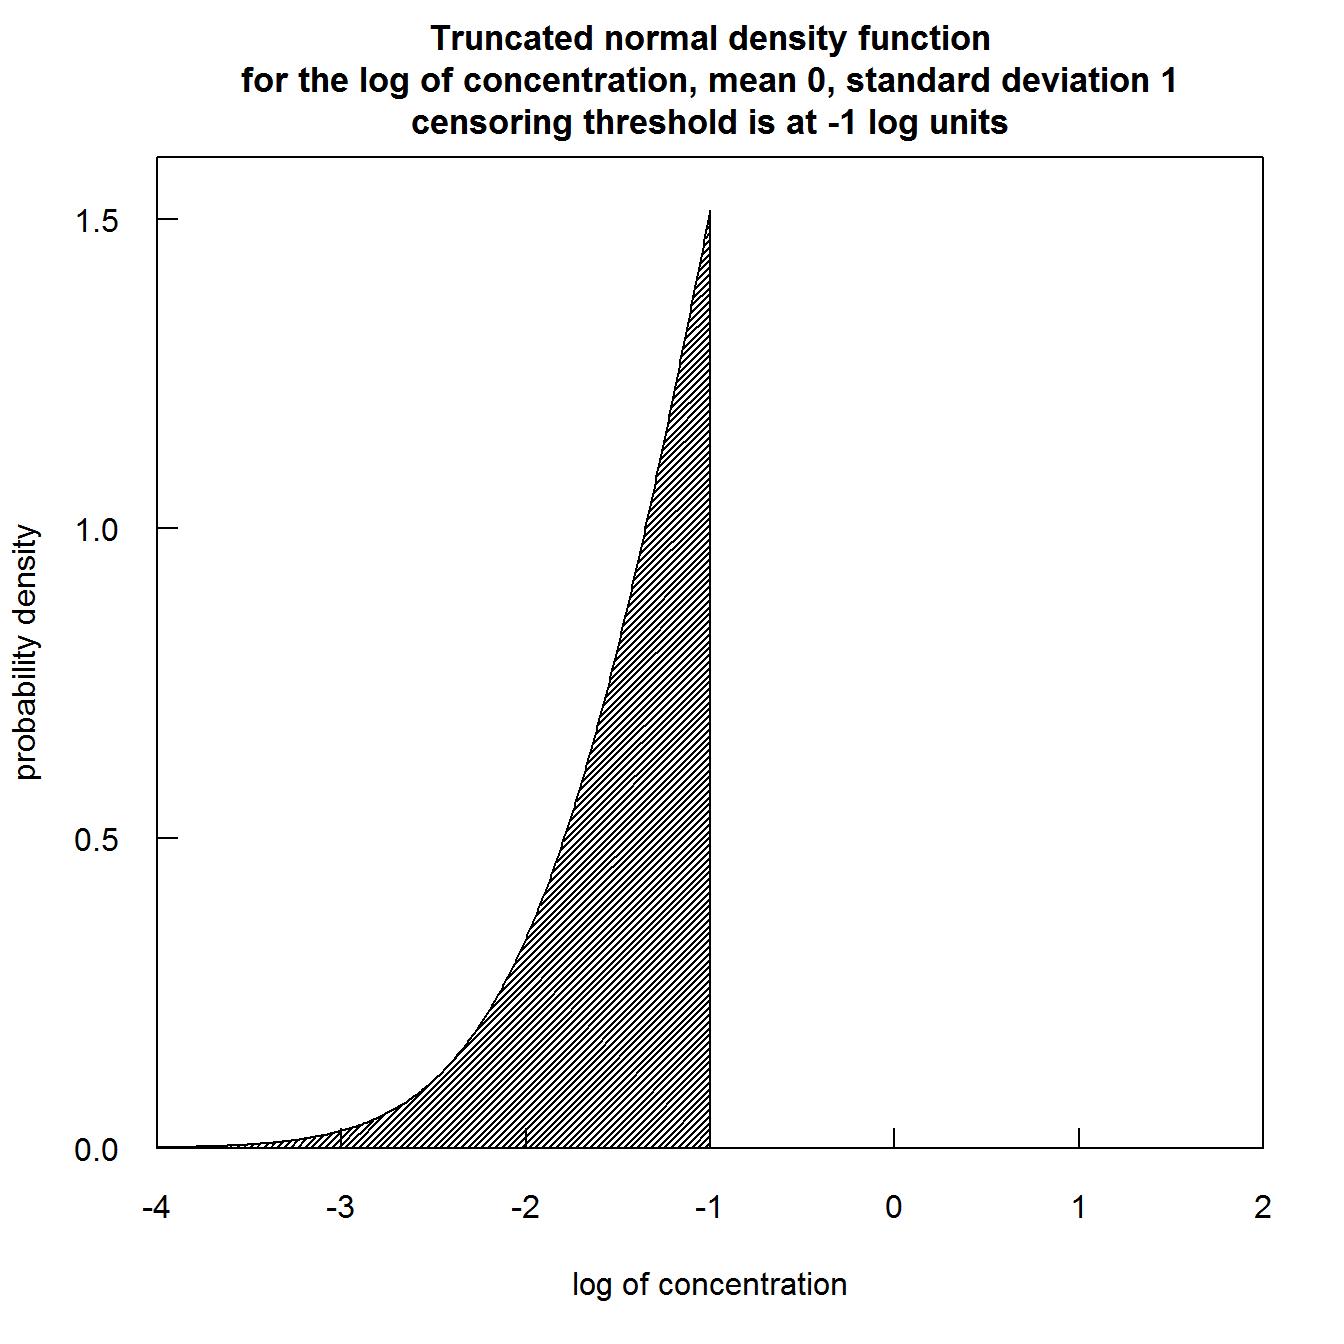 Truncated normal distribution images